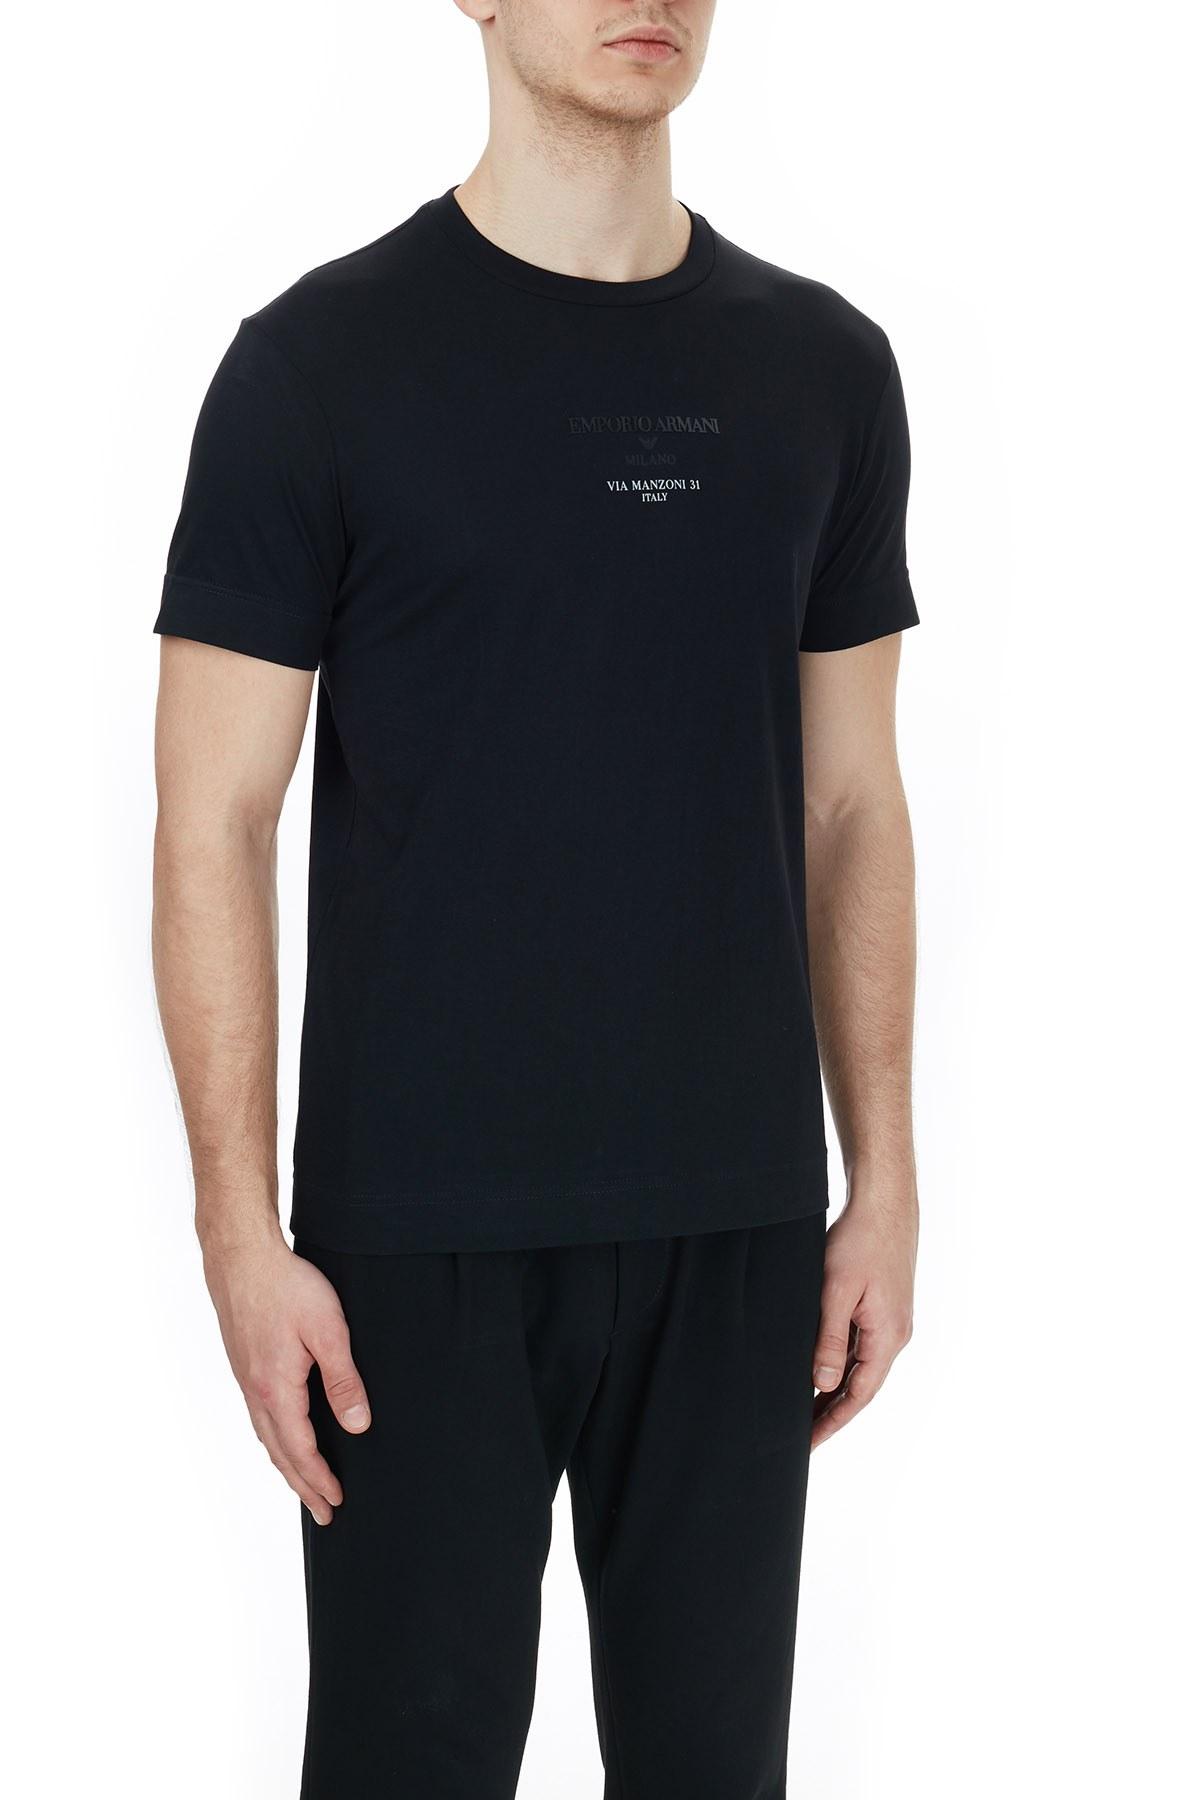 Emporio Armani Baskılı Bisiklet Yaka % 100 Pamuk Erkek T Shirt 6H1T6G 1JSHZ 0999 SİYAH